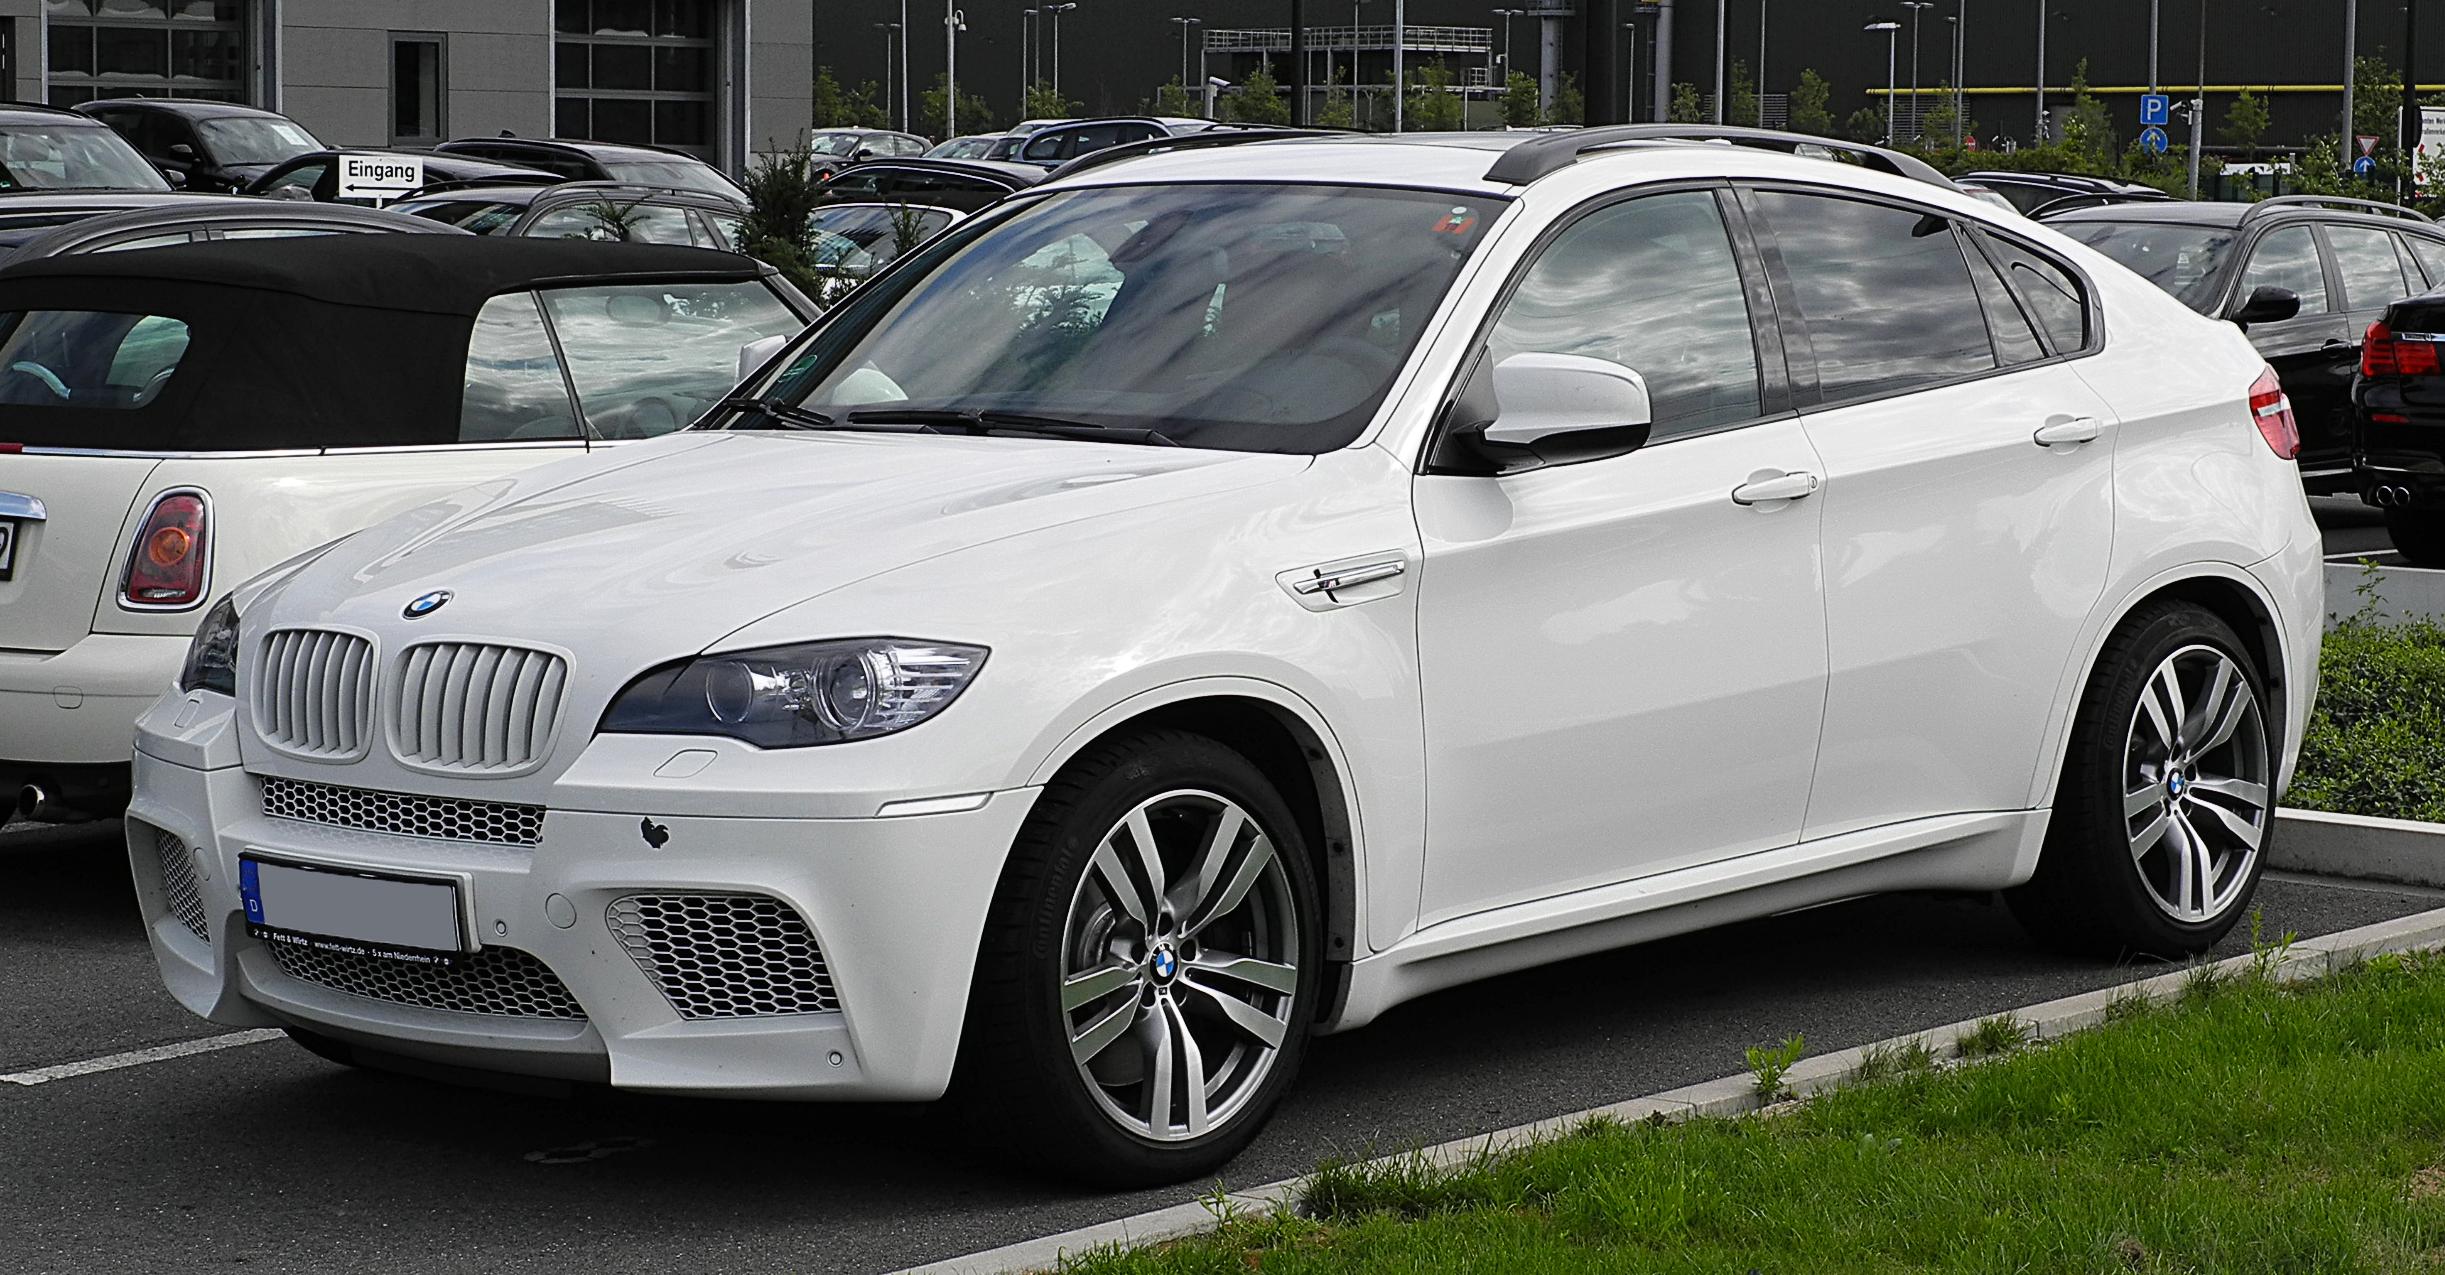 BMW X6 I (E71) 2007 - 2012 SUV 5 door #2